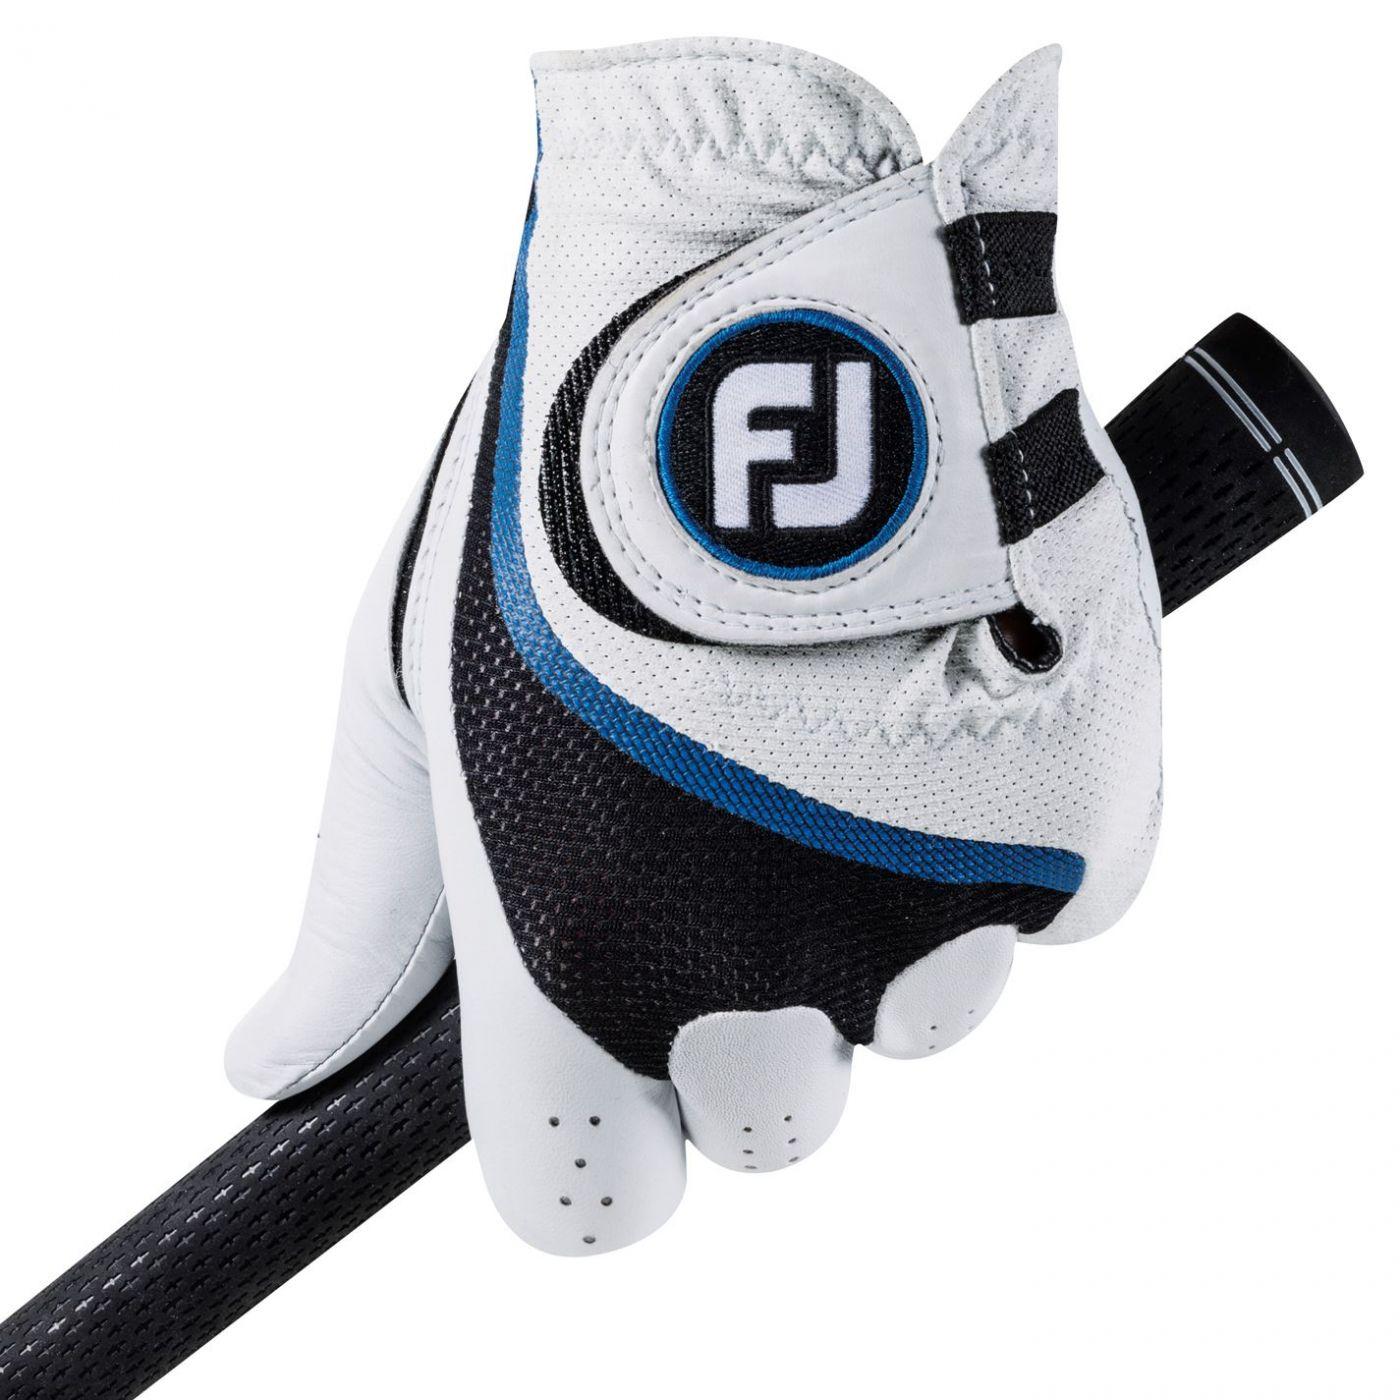 Footjoy Proflx Glove 00